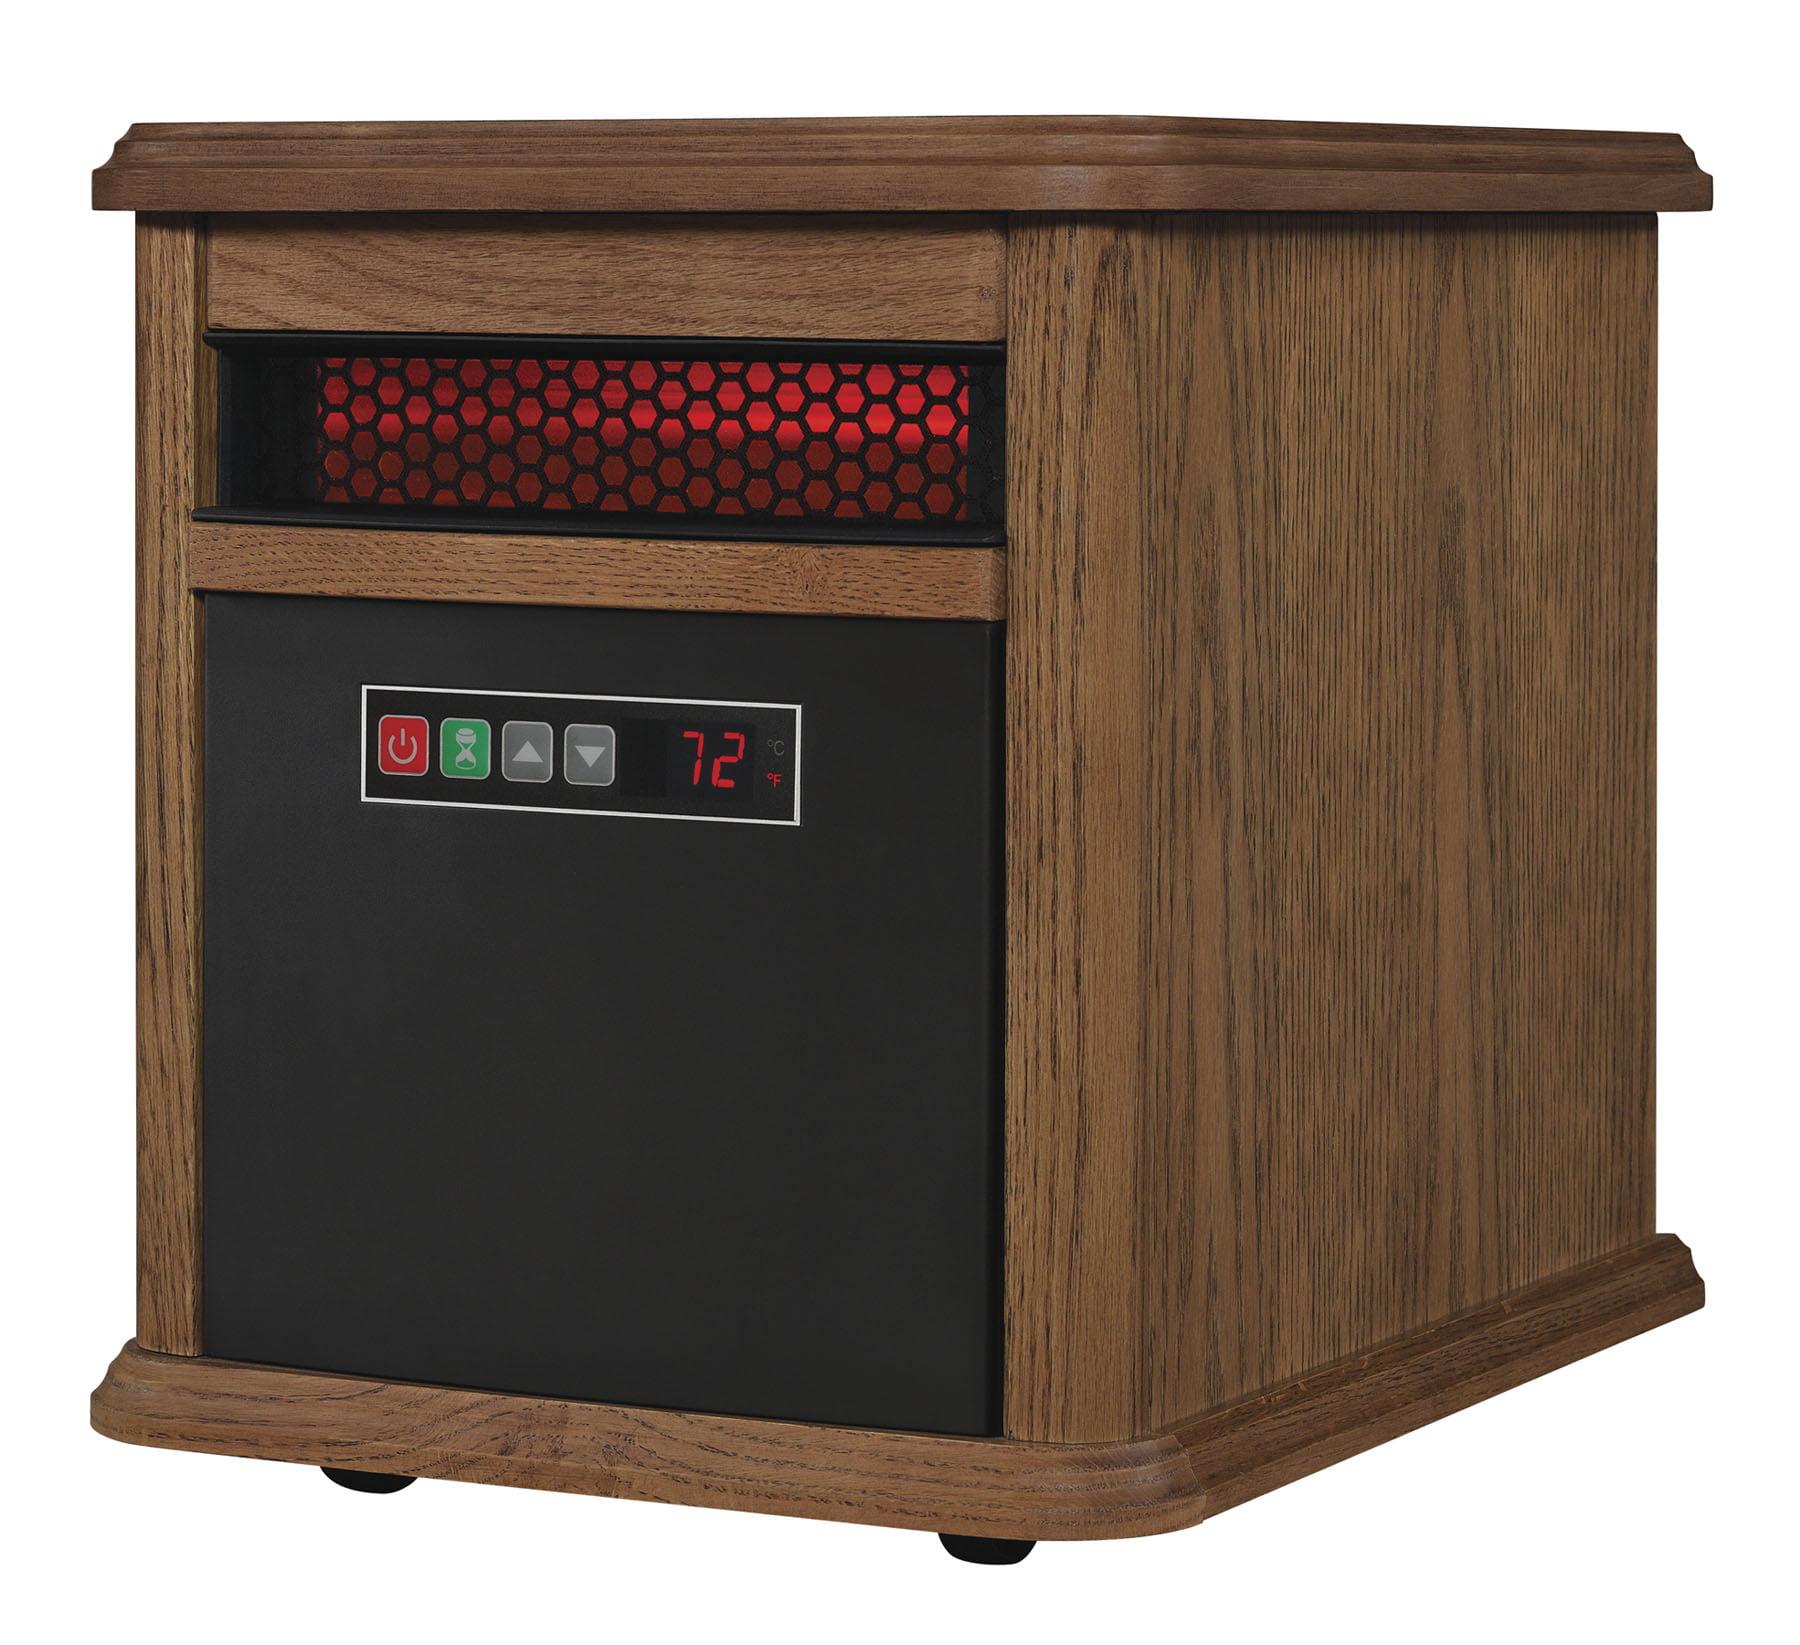 Twin-Star International Duraflame Portable Electric Infrared Quartz Heater, Oak